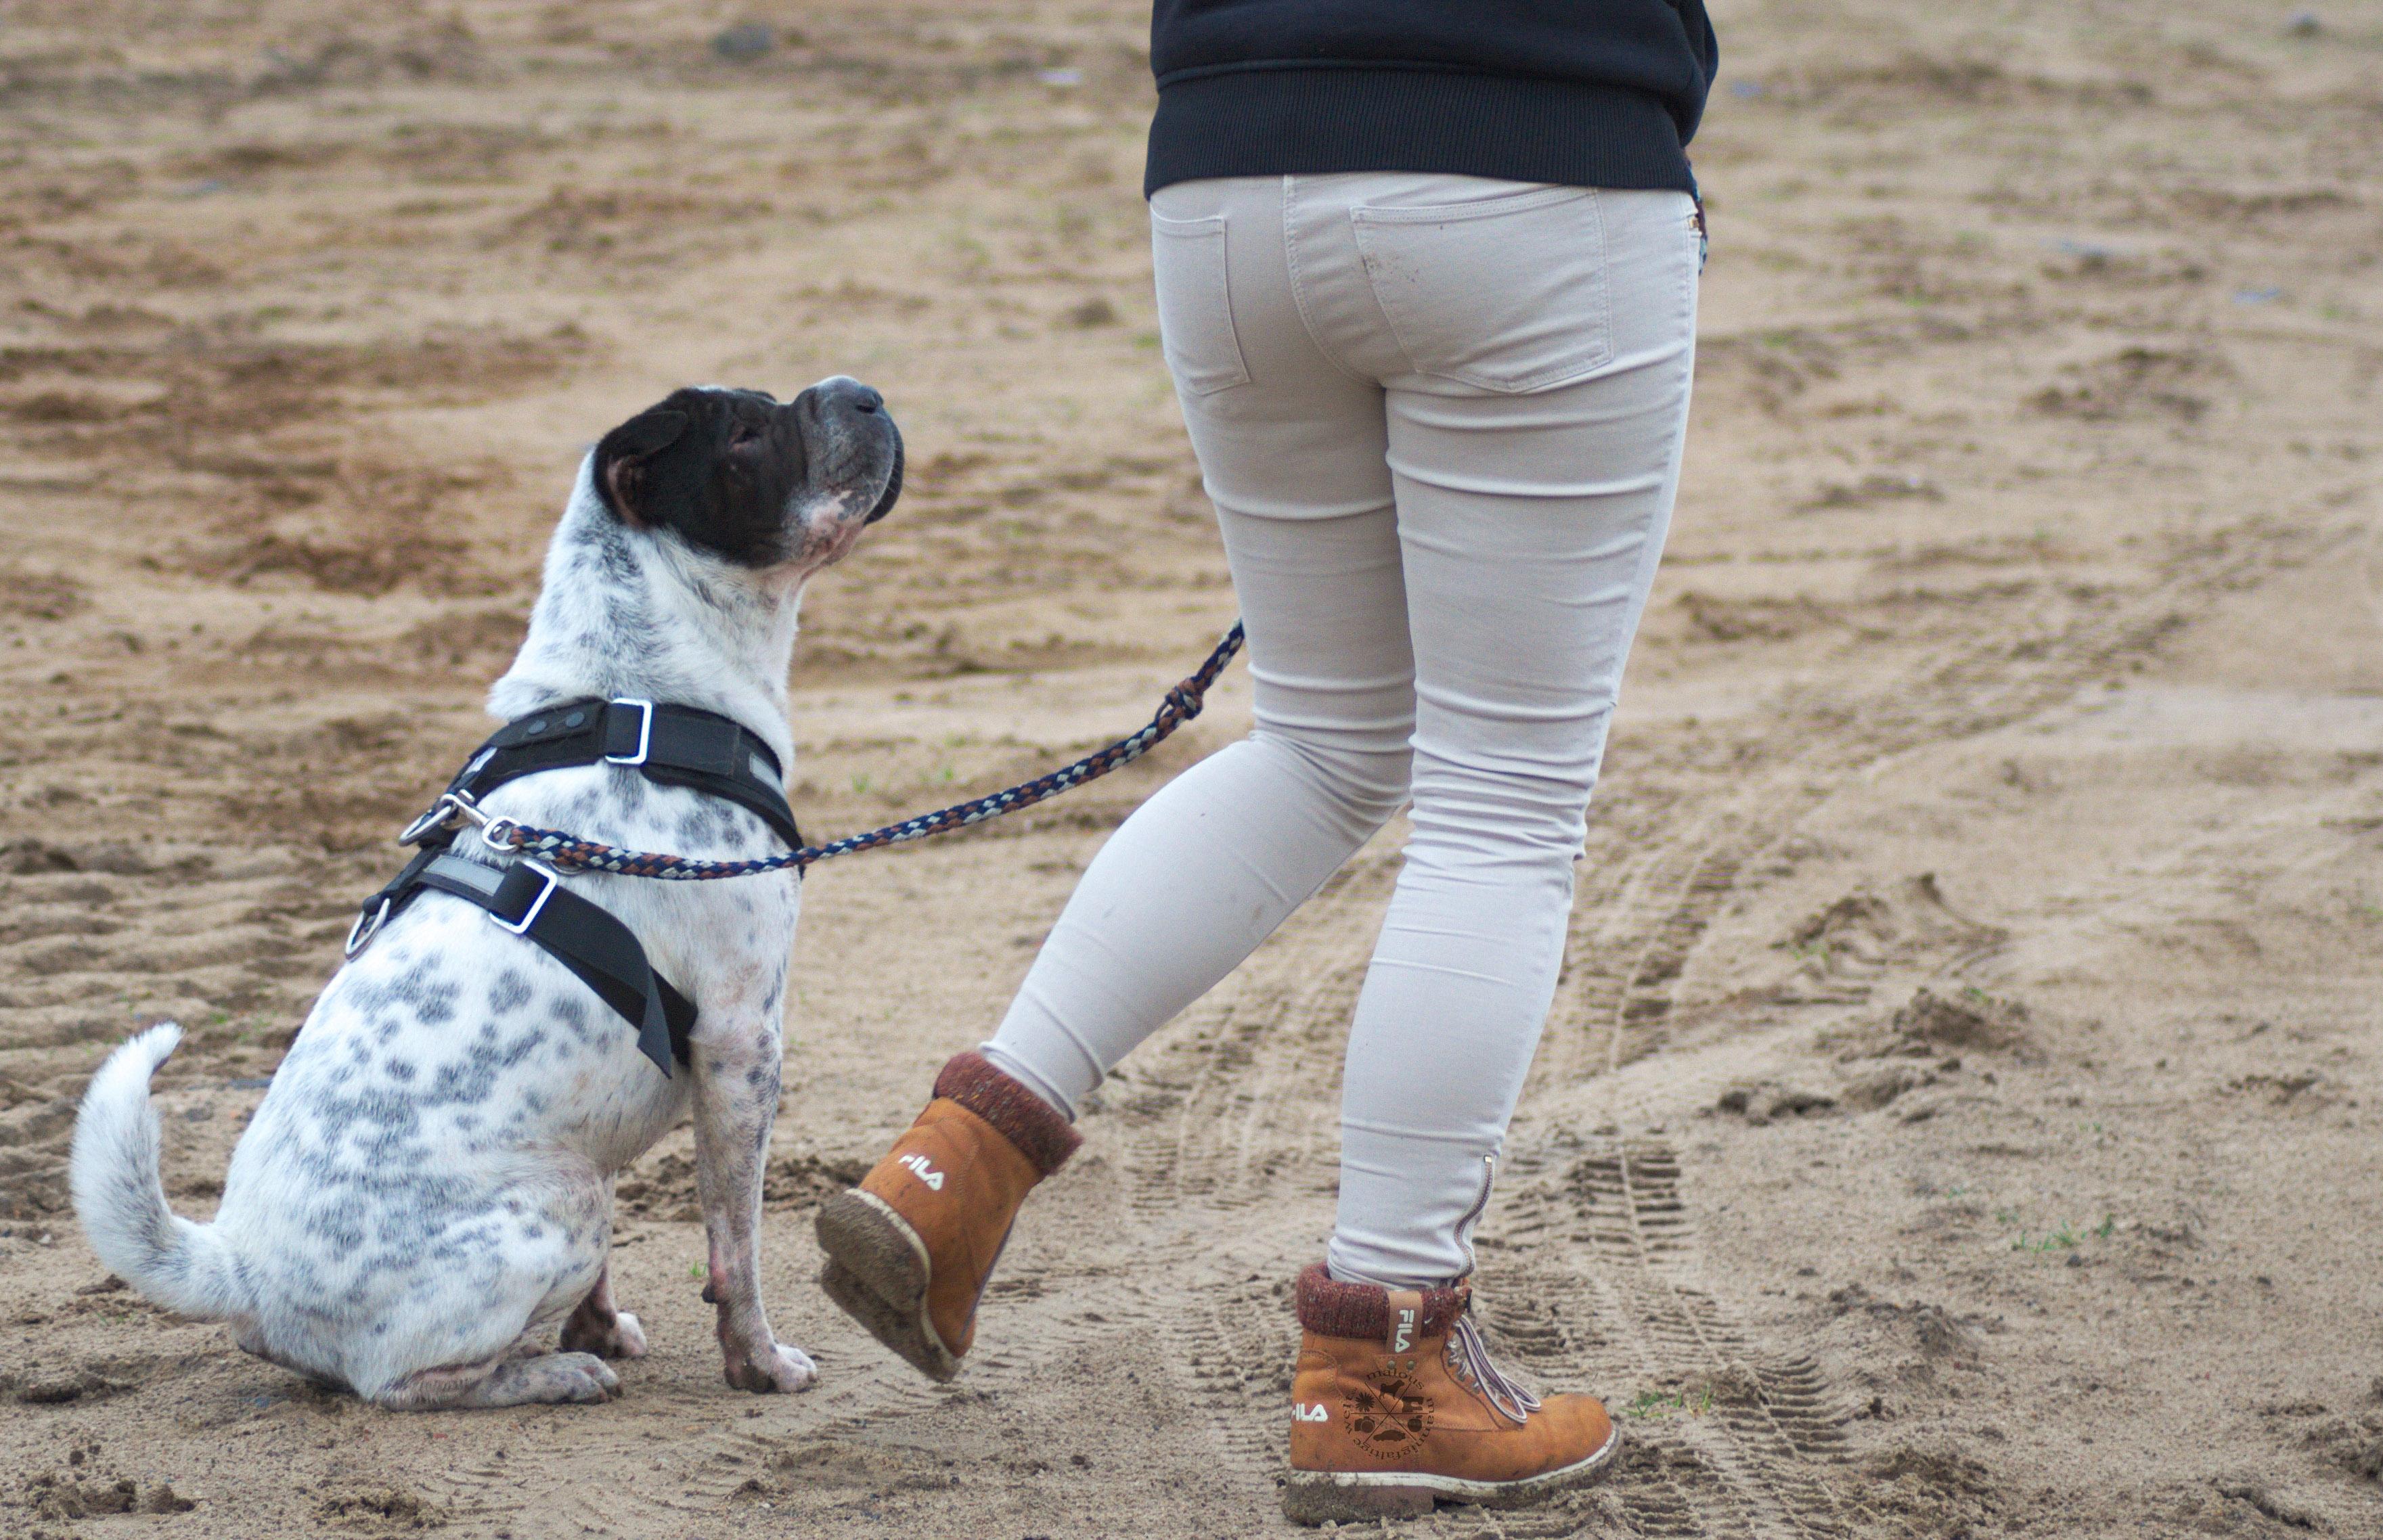 Kleinmetall Kingston Geschirr Shar Pei Hund Hunde Blog Hundeblog Test Produkttest Fafit Autogeschirr Sicherung TÜV Video MMW